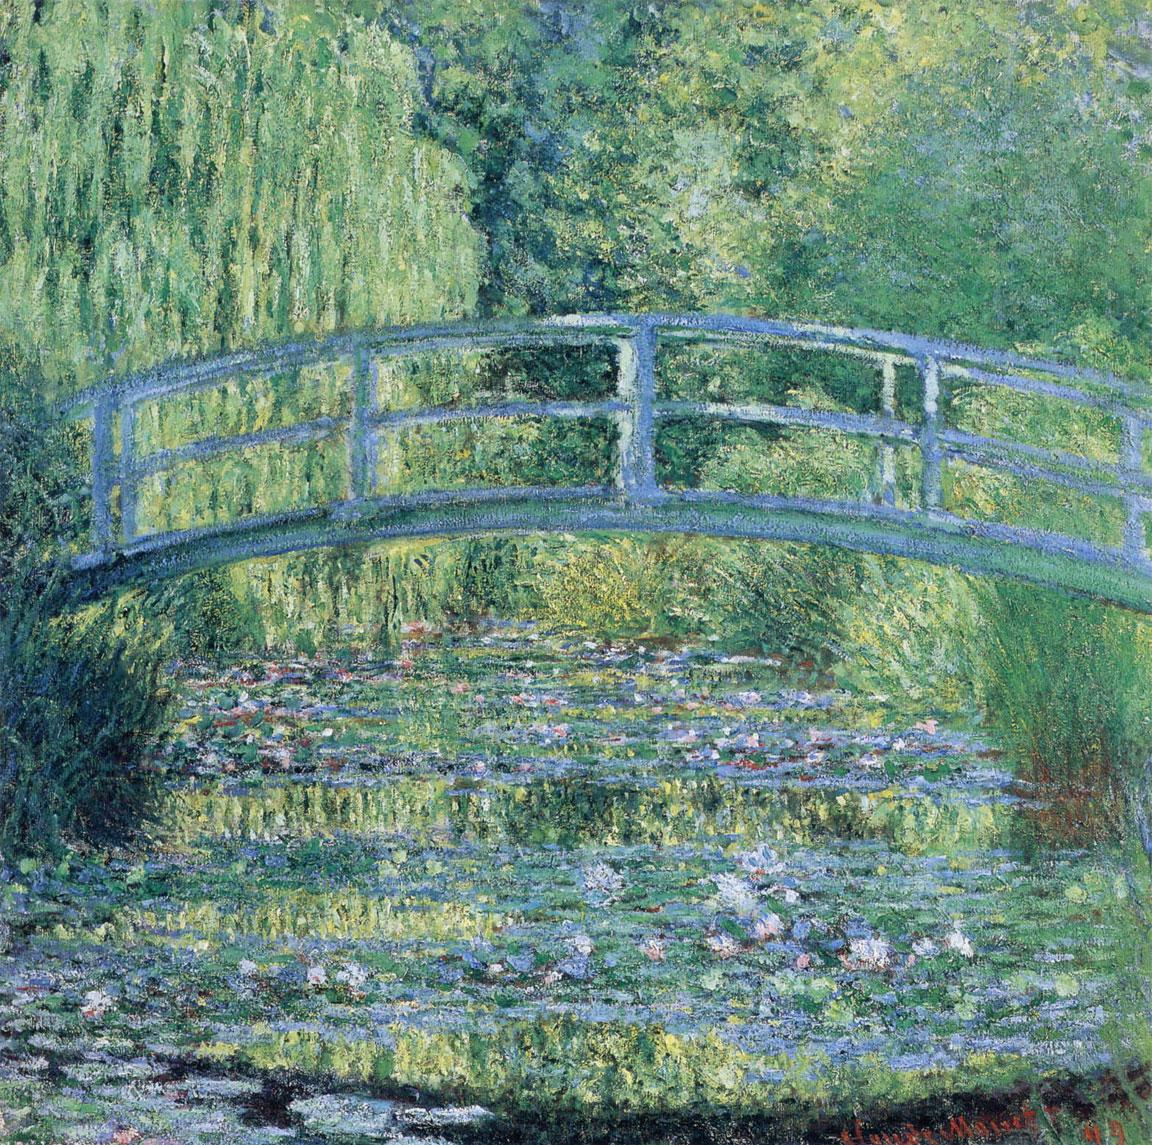 Stagno delle ninfee, armonia verde • Le Bassin aux Nymphéas, harmonie verte • Waterlily pond, green harmony